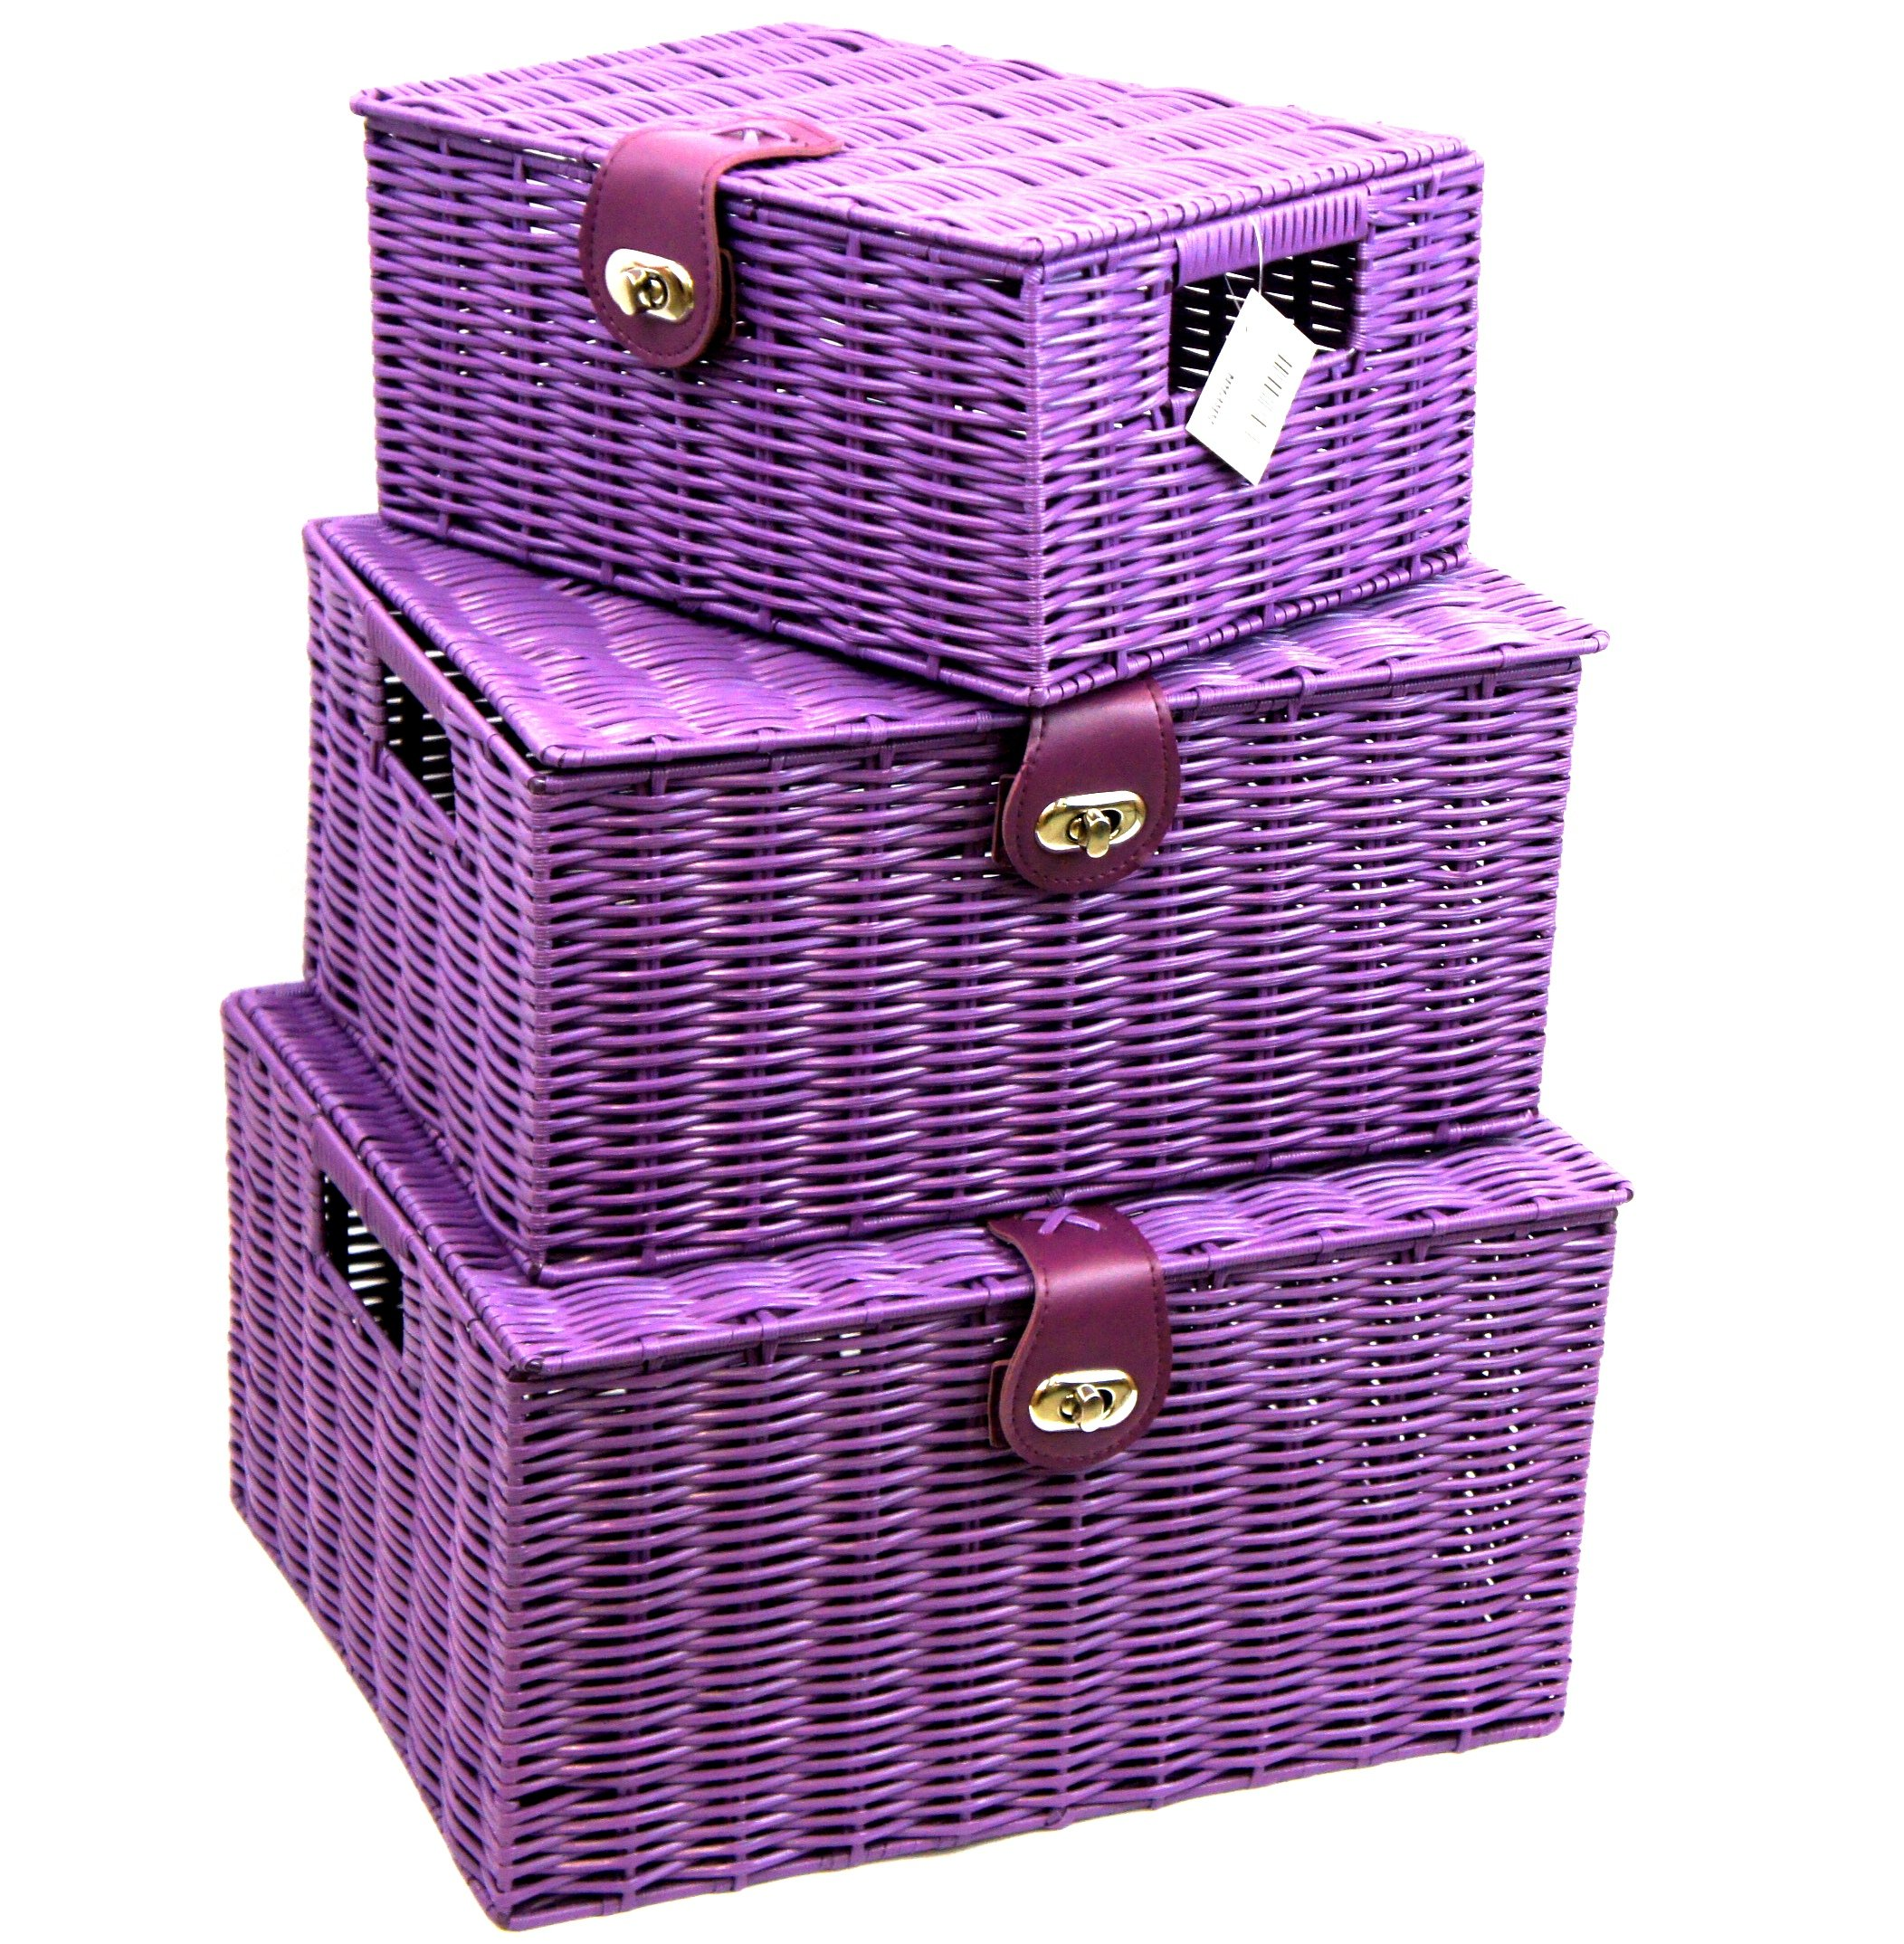 Arpan Set of 3 Resin Woven Storage Basket Box With Lid u0026 Lock (White)  sc 1 st  Amazon UK & Bathroom Storage Baskets: Amazon.co.uk